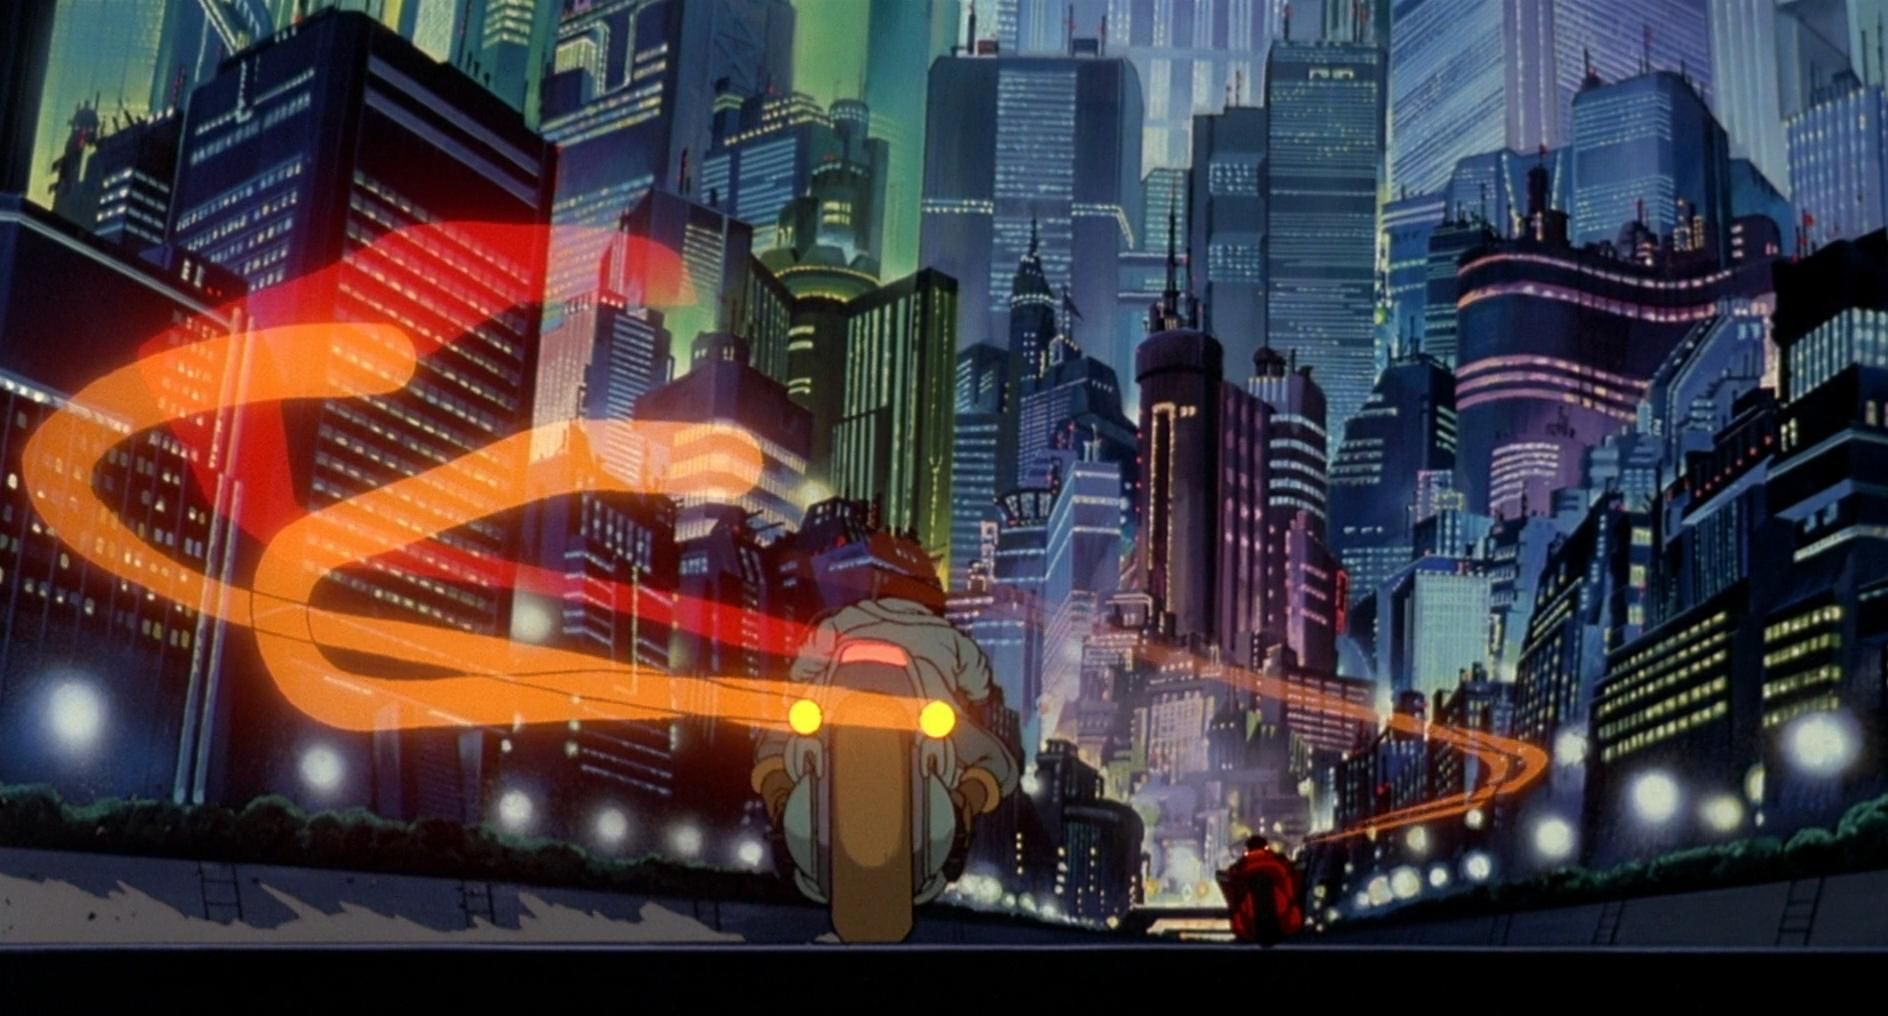 Pin By Nolan James On Watch Akira Anime Scenery Anime Scenery Wallpaper